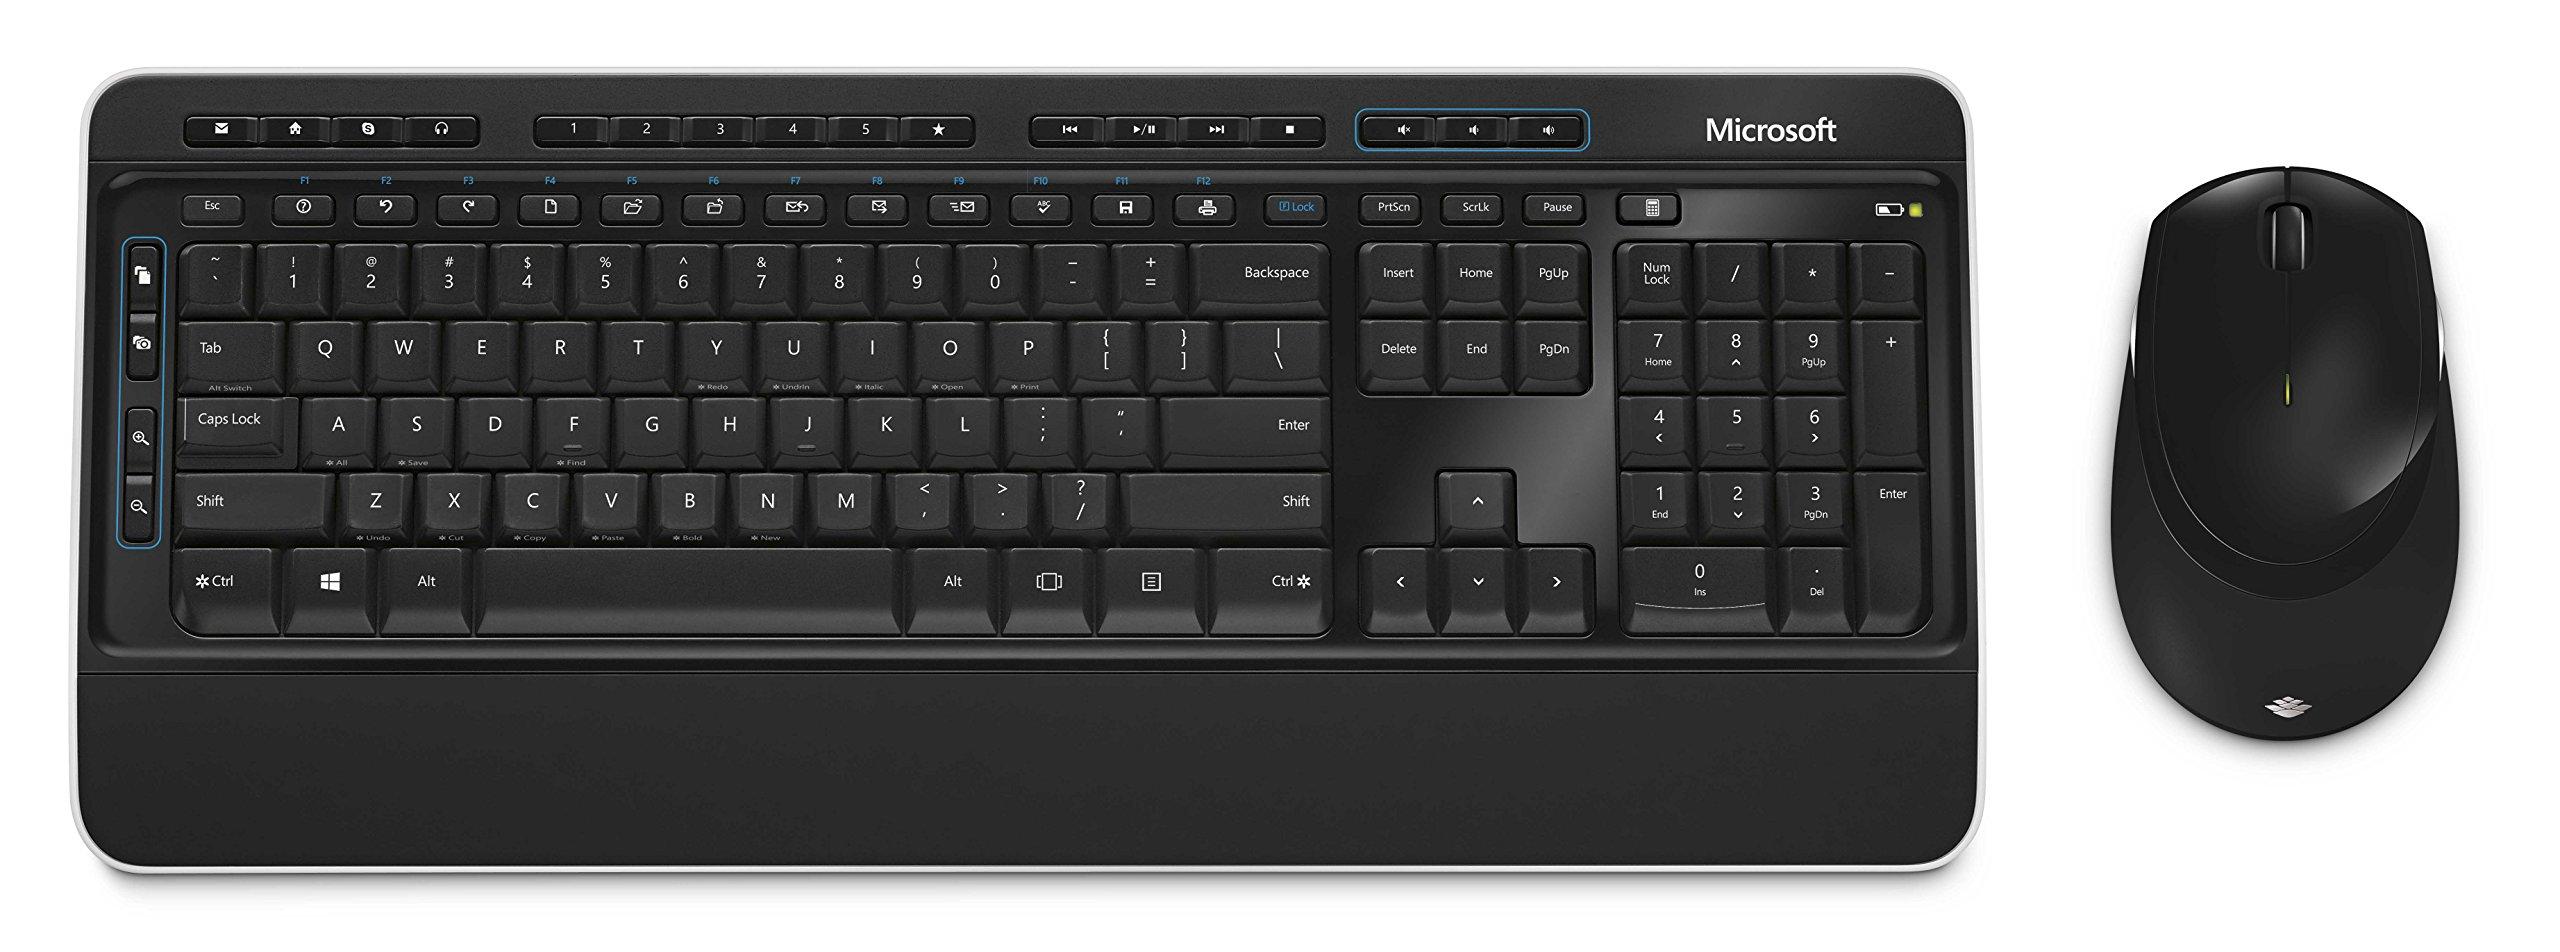 Microsoft-Wireless-Comfort-Desktop-5050-Black-Keyboard-and-Mouse